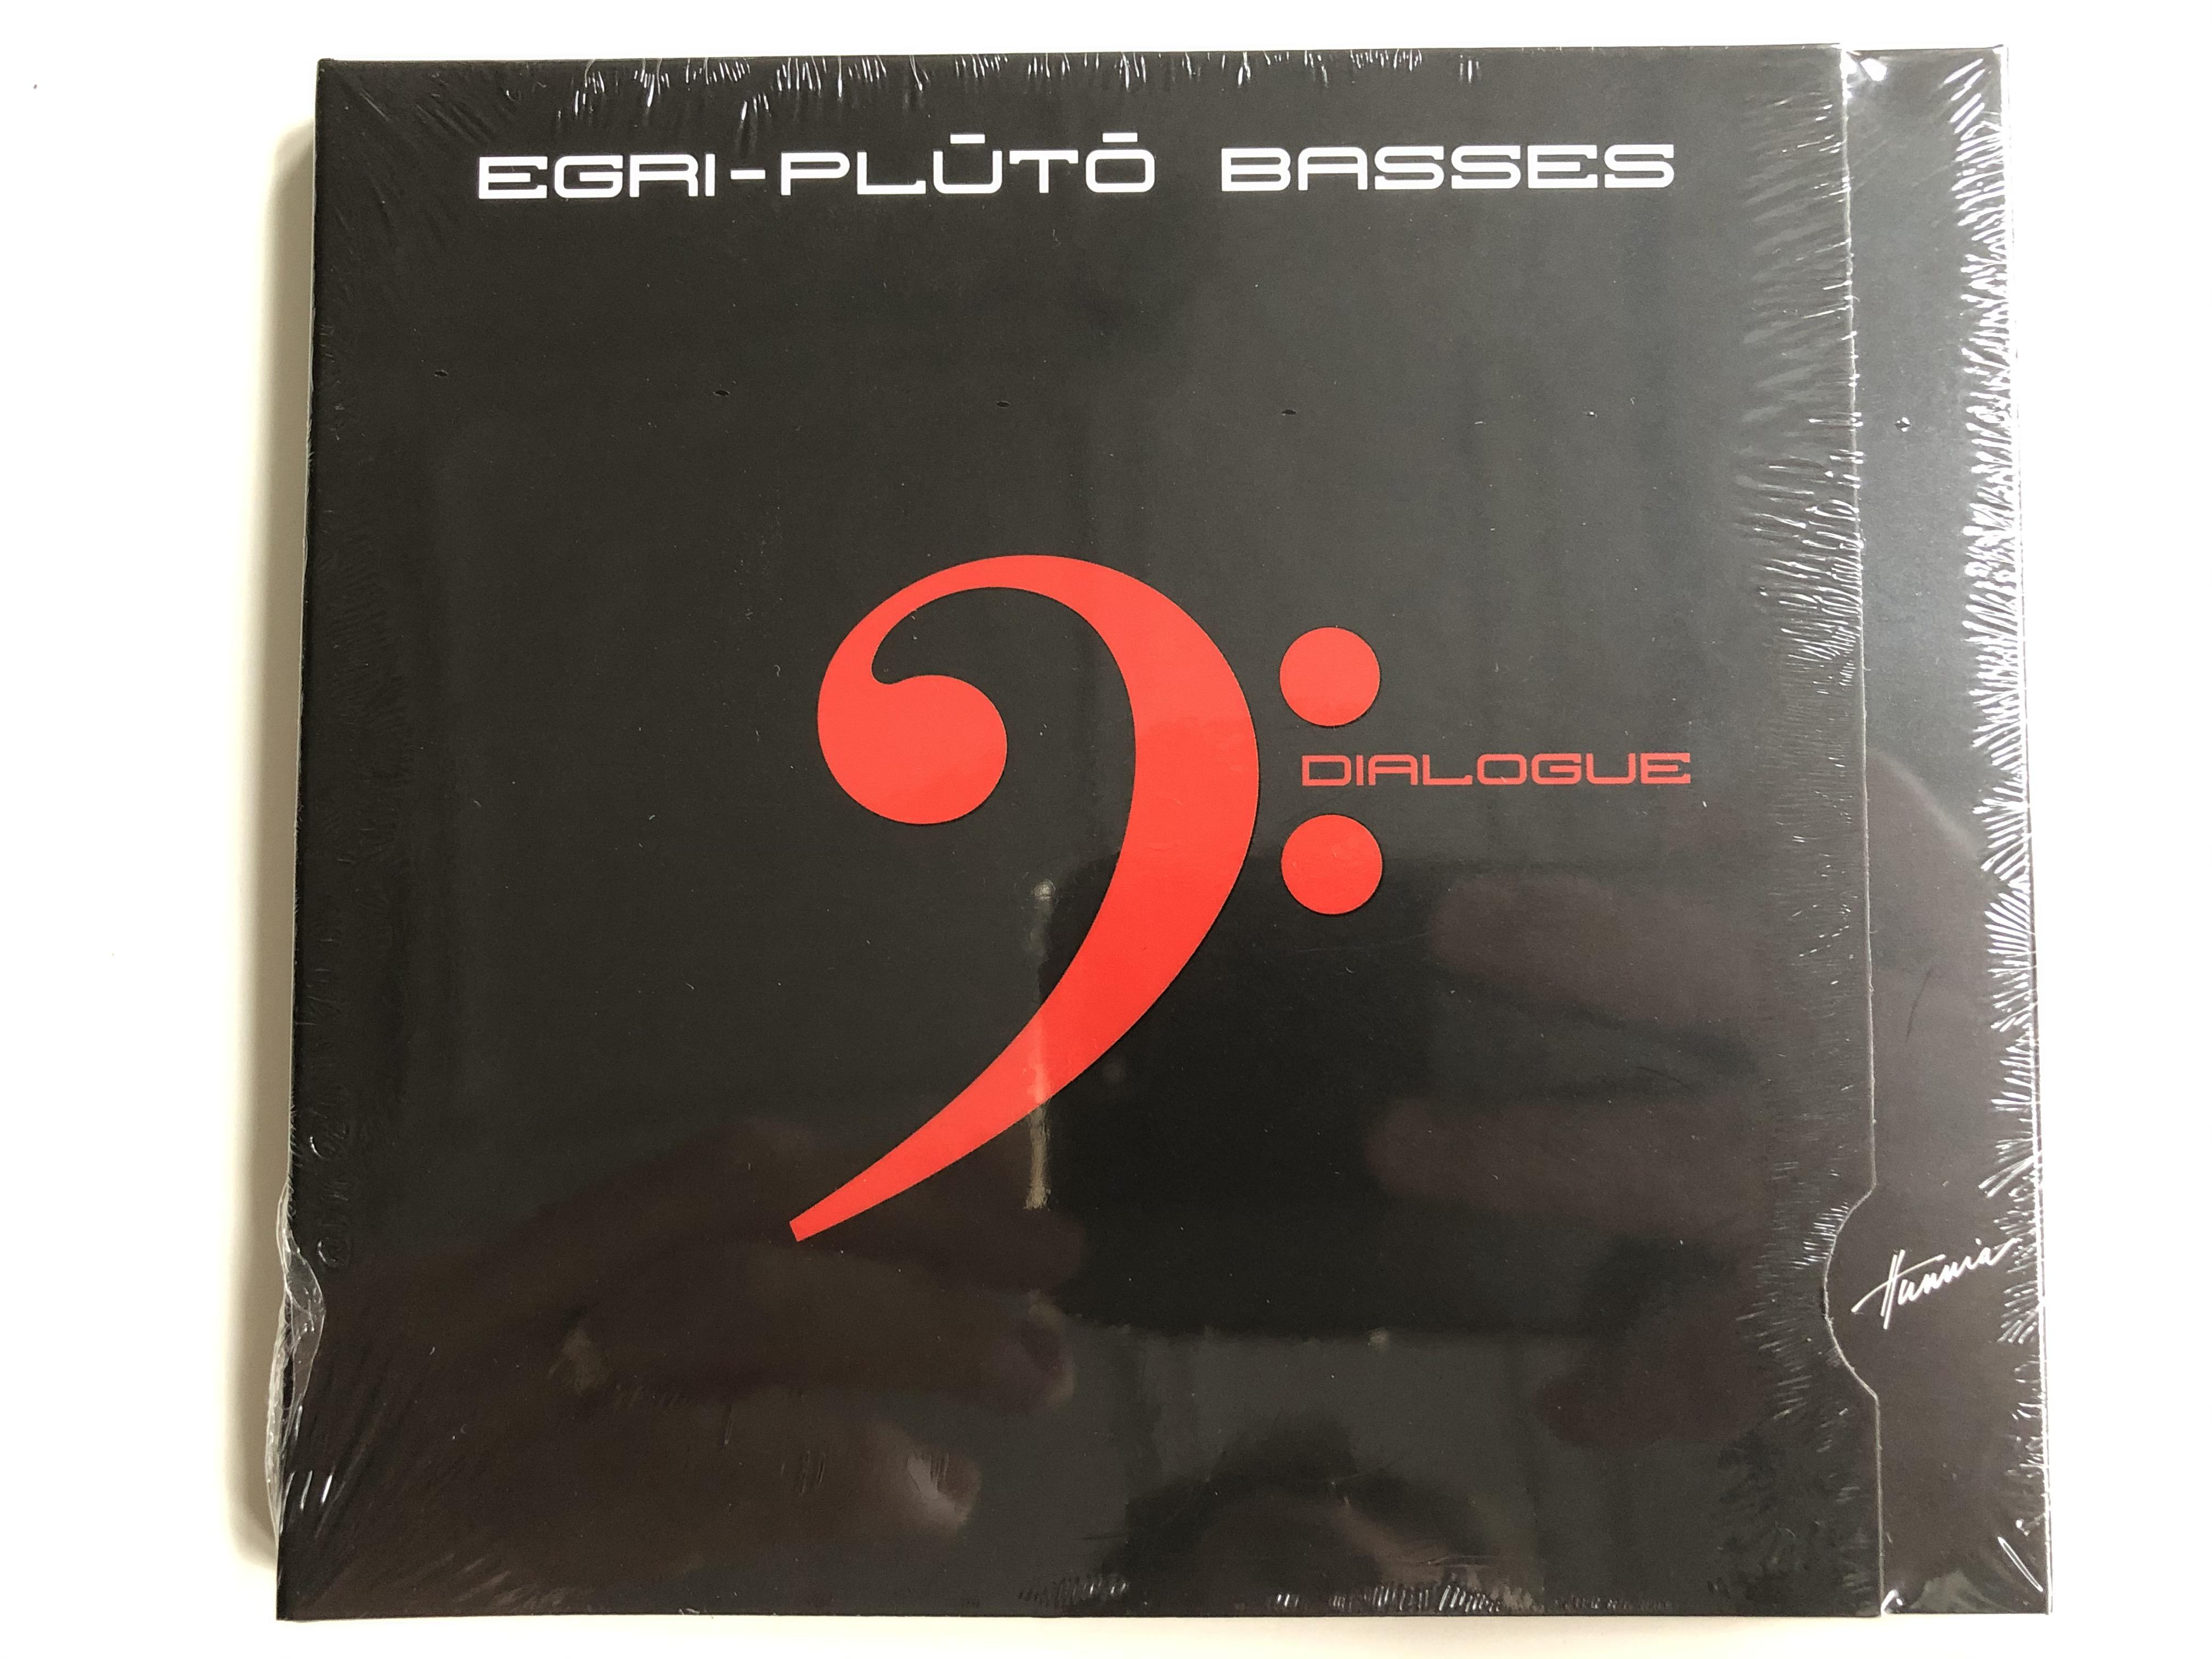 egri-pluto-basses-dialogue-hunnia-records-film-production-audio-cd-2011-hrcd-4709-1-.jpg